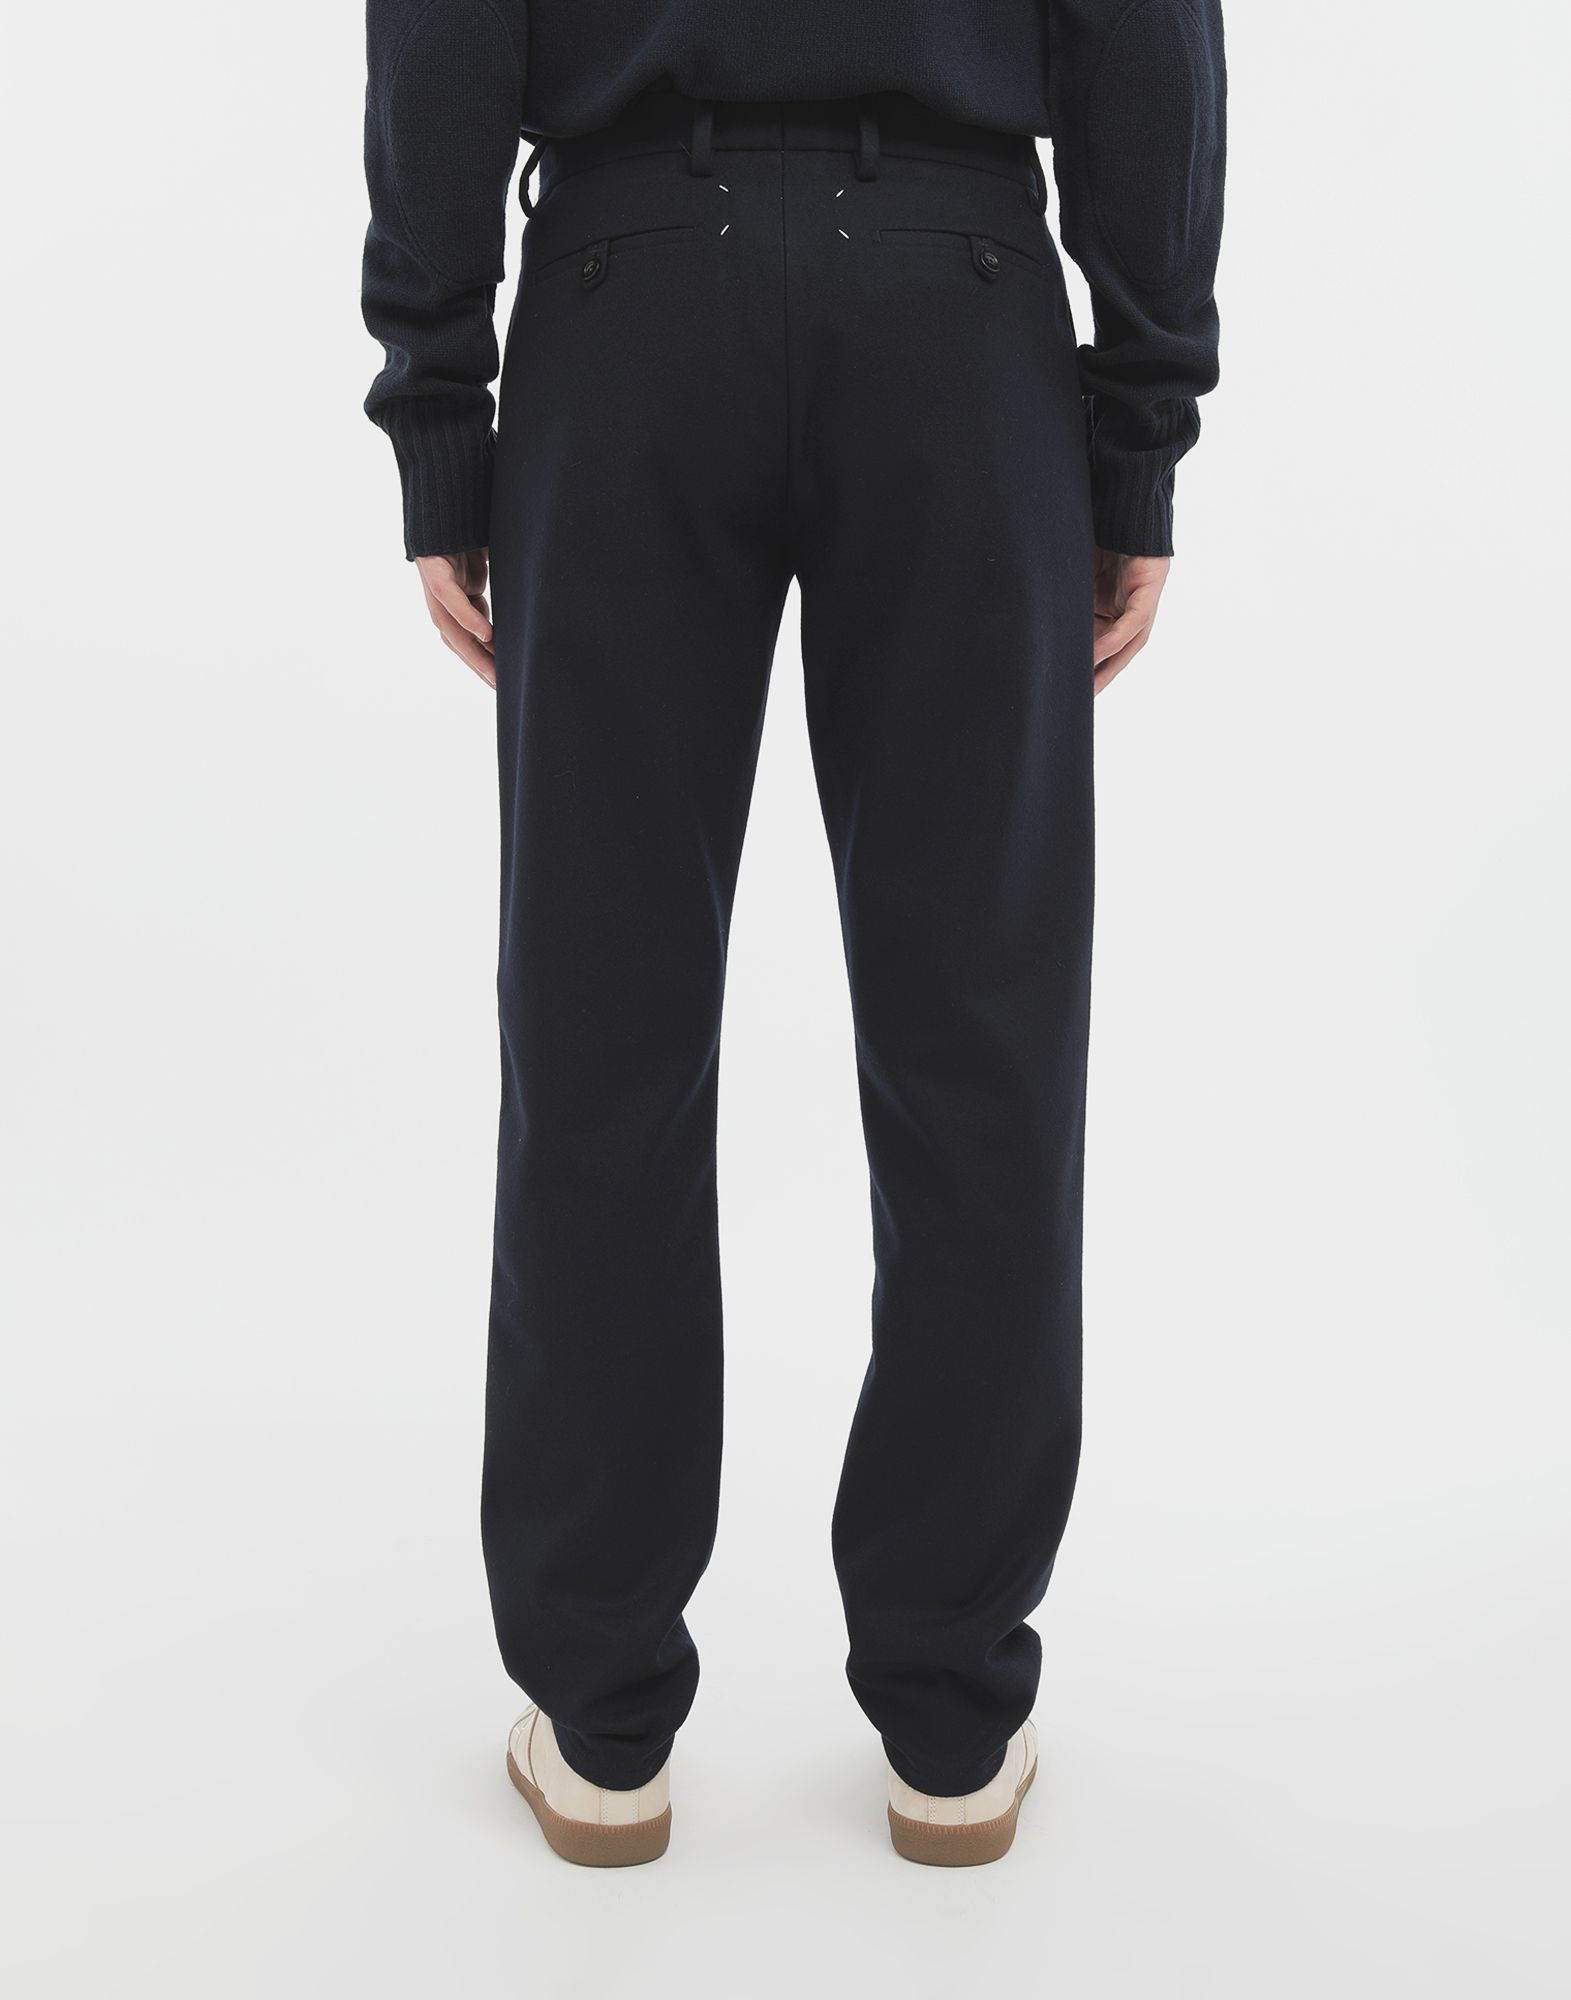 MAISON MARGIELA Wool trousers Trousers Man e